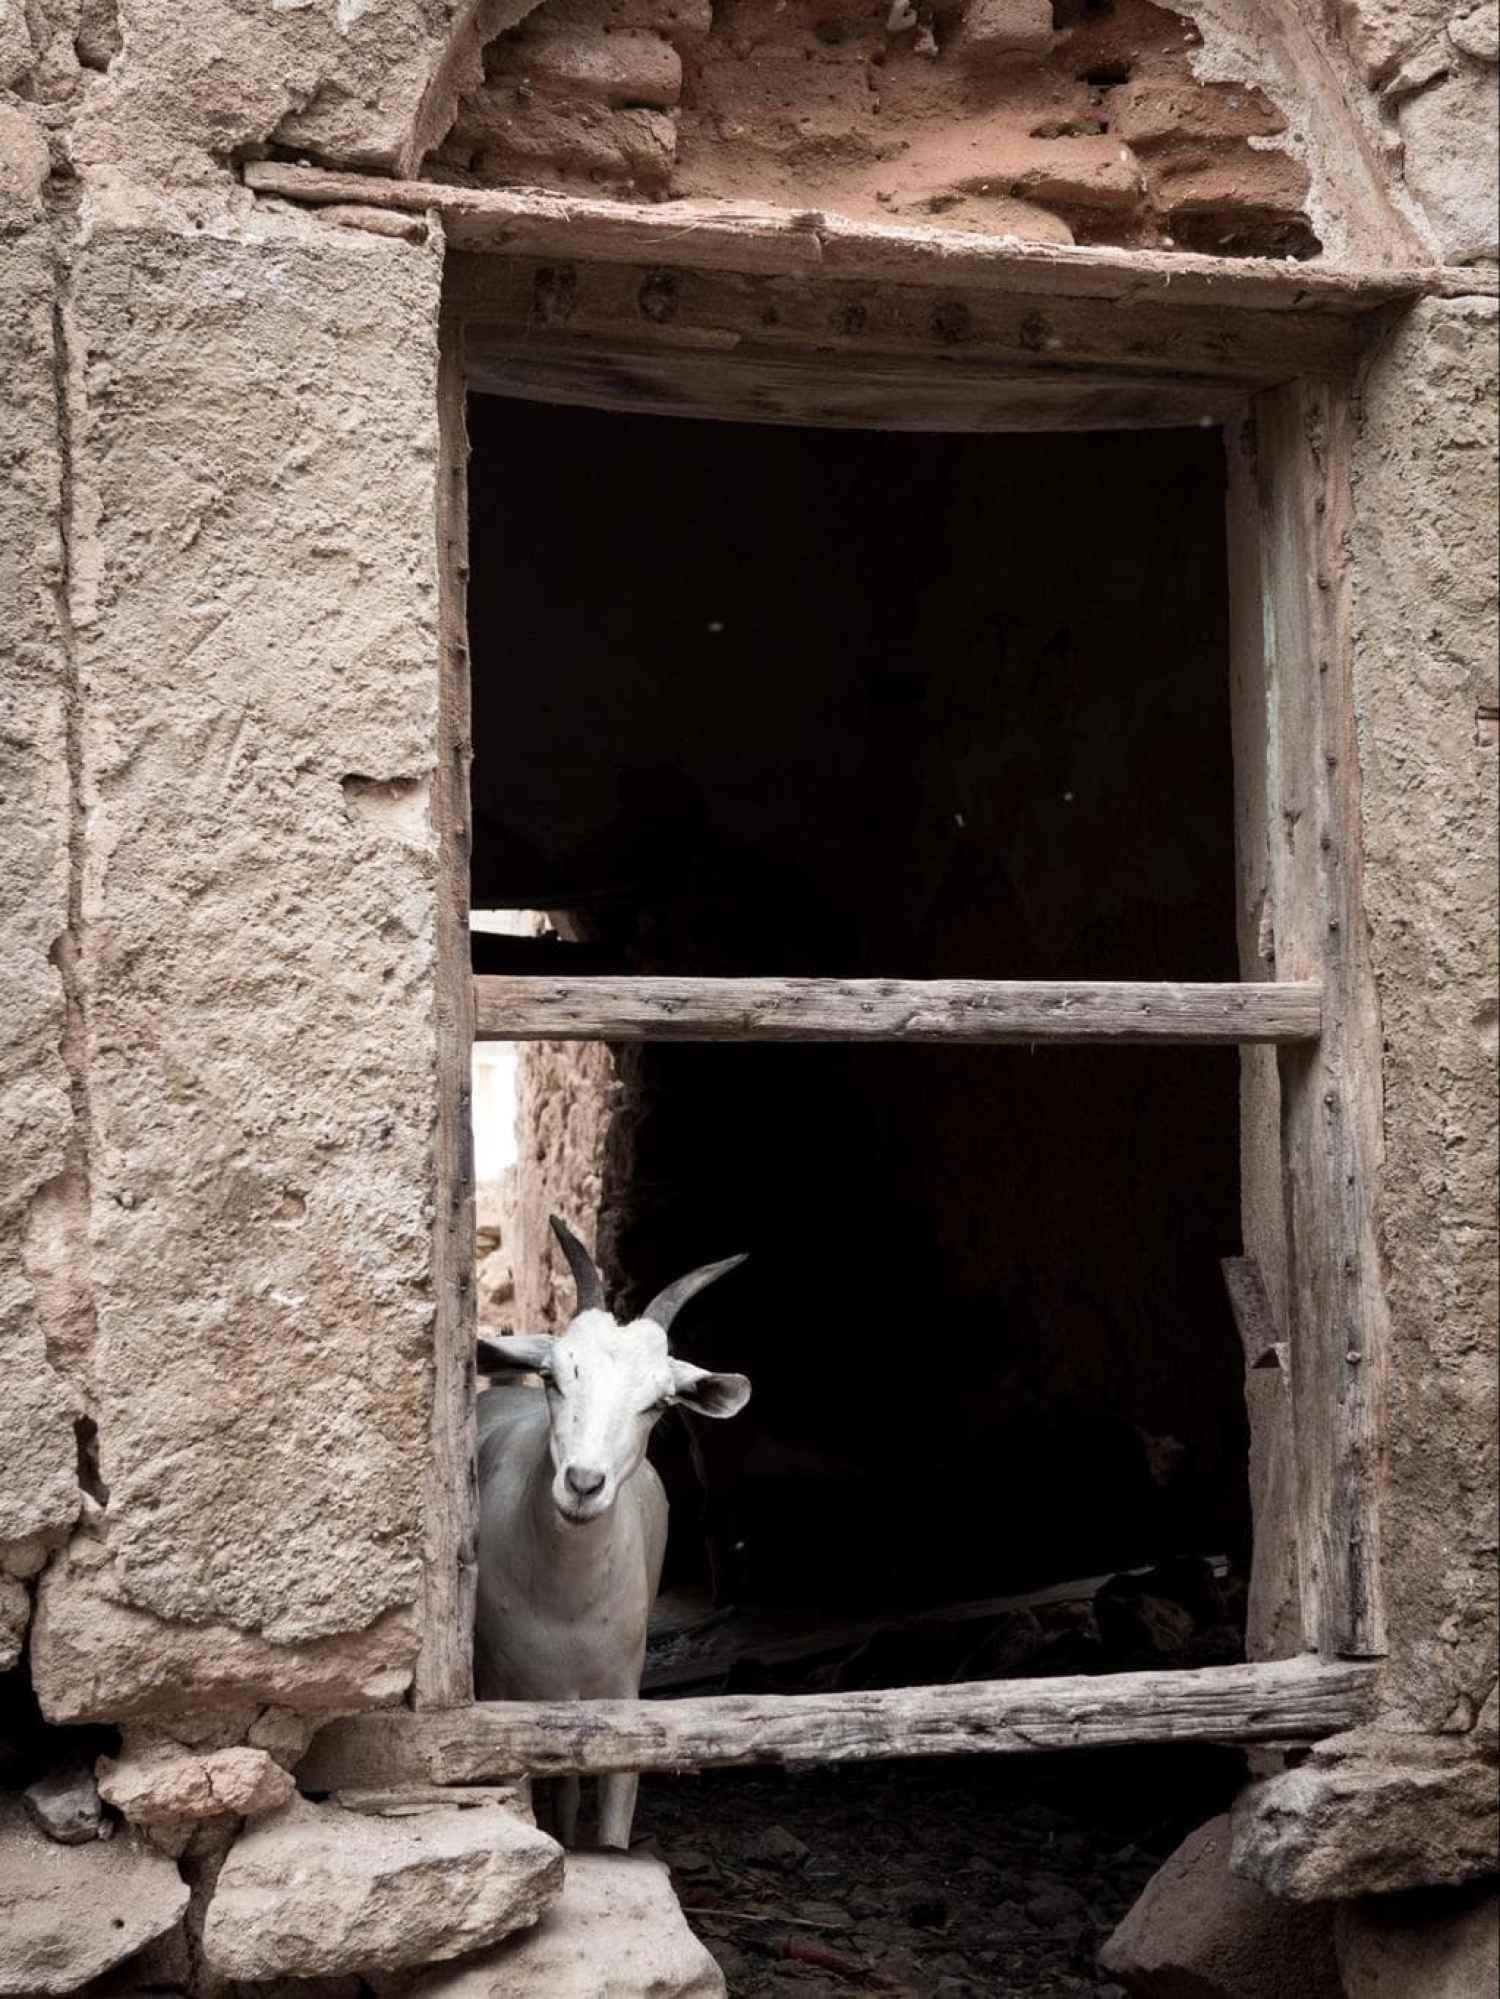 Funny goats in ruined buildings of Berbera